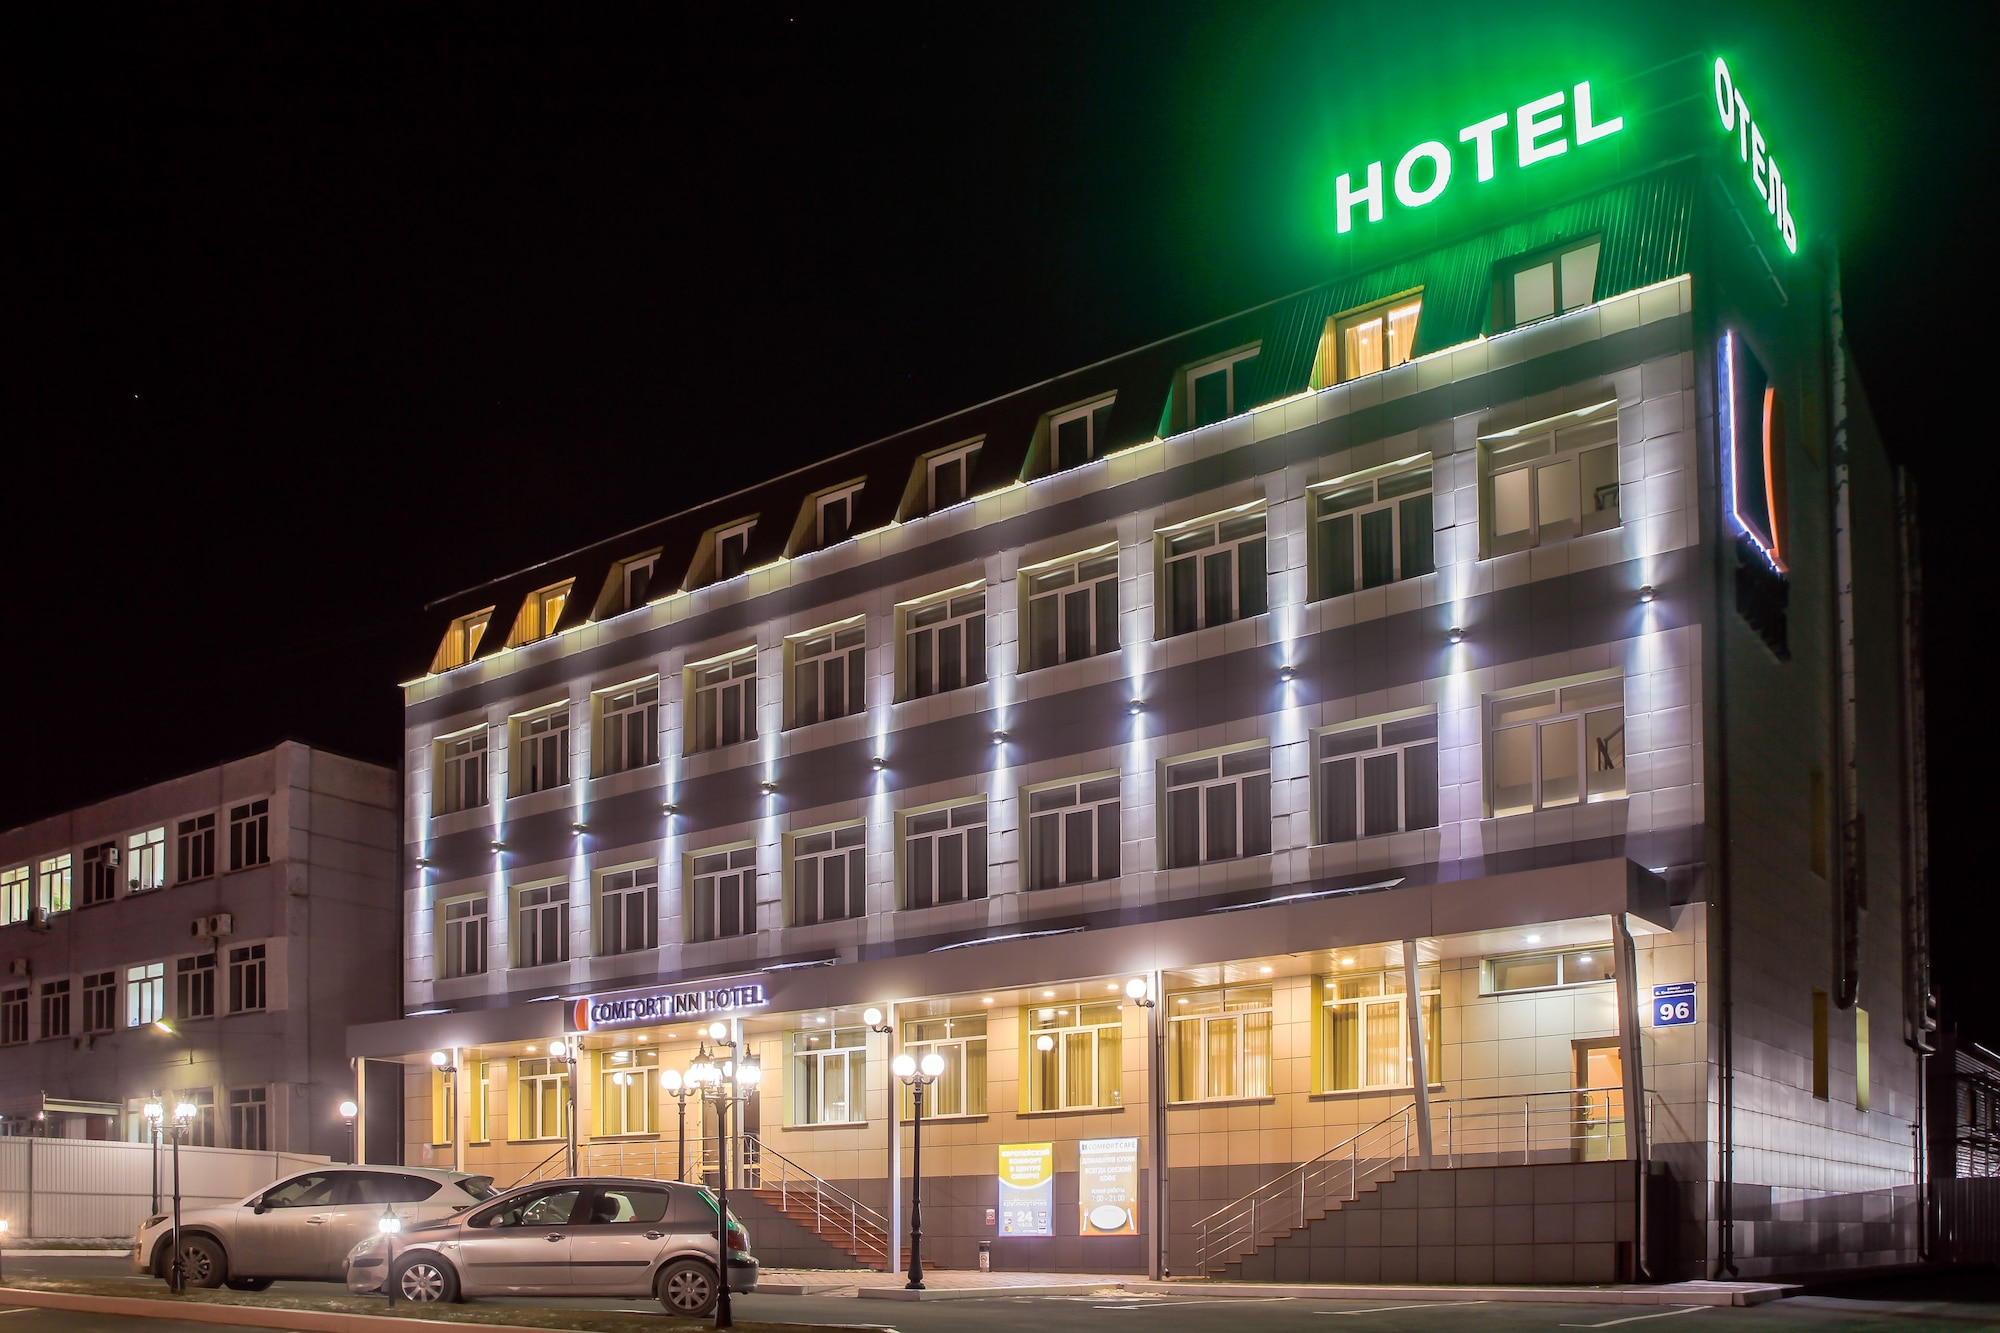 Comfort INN Hotel, Novosibirskiy rayon